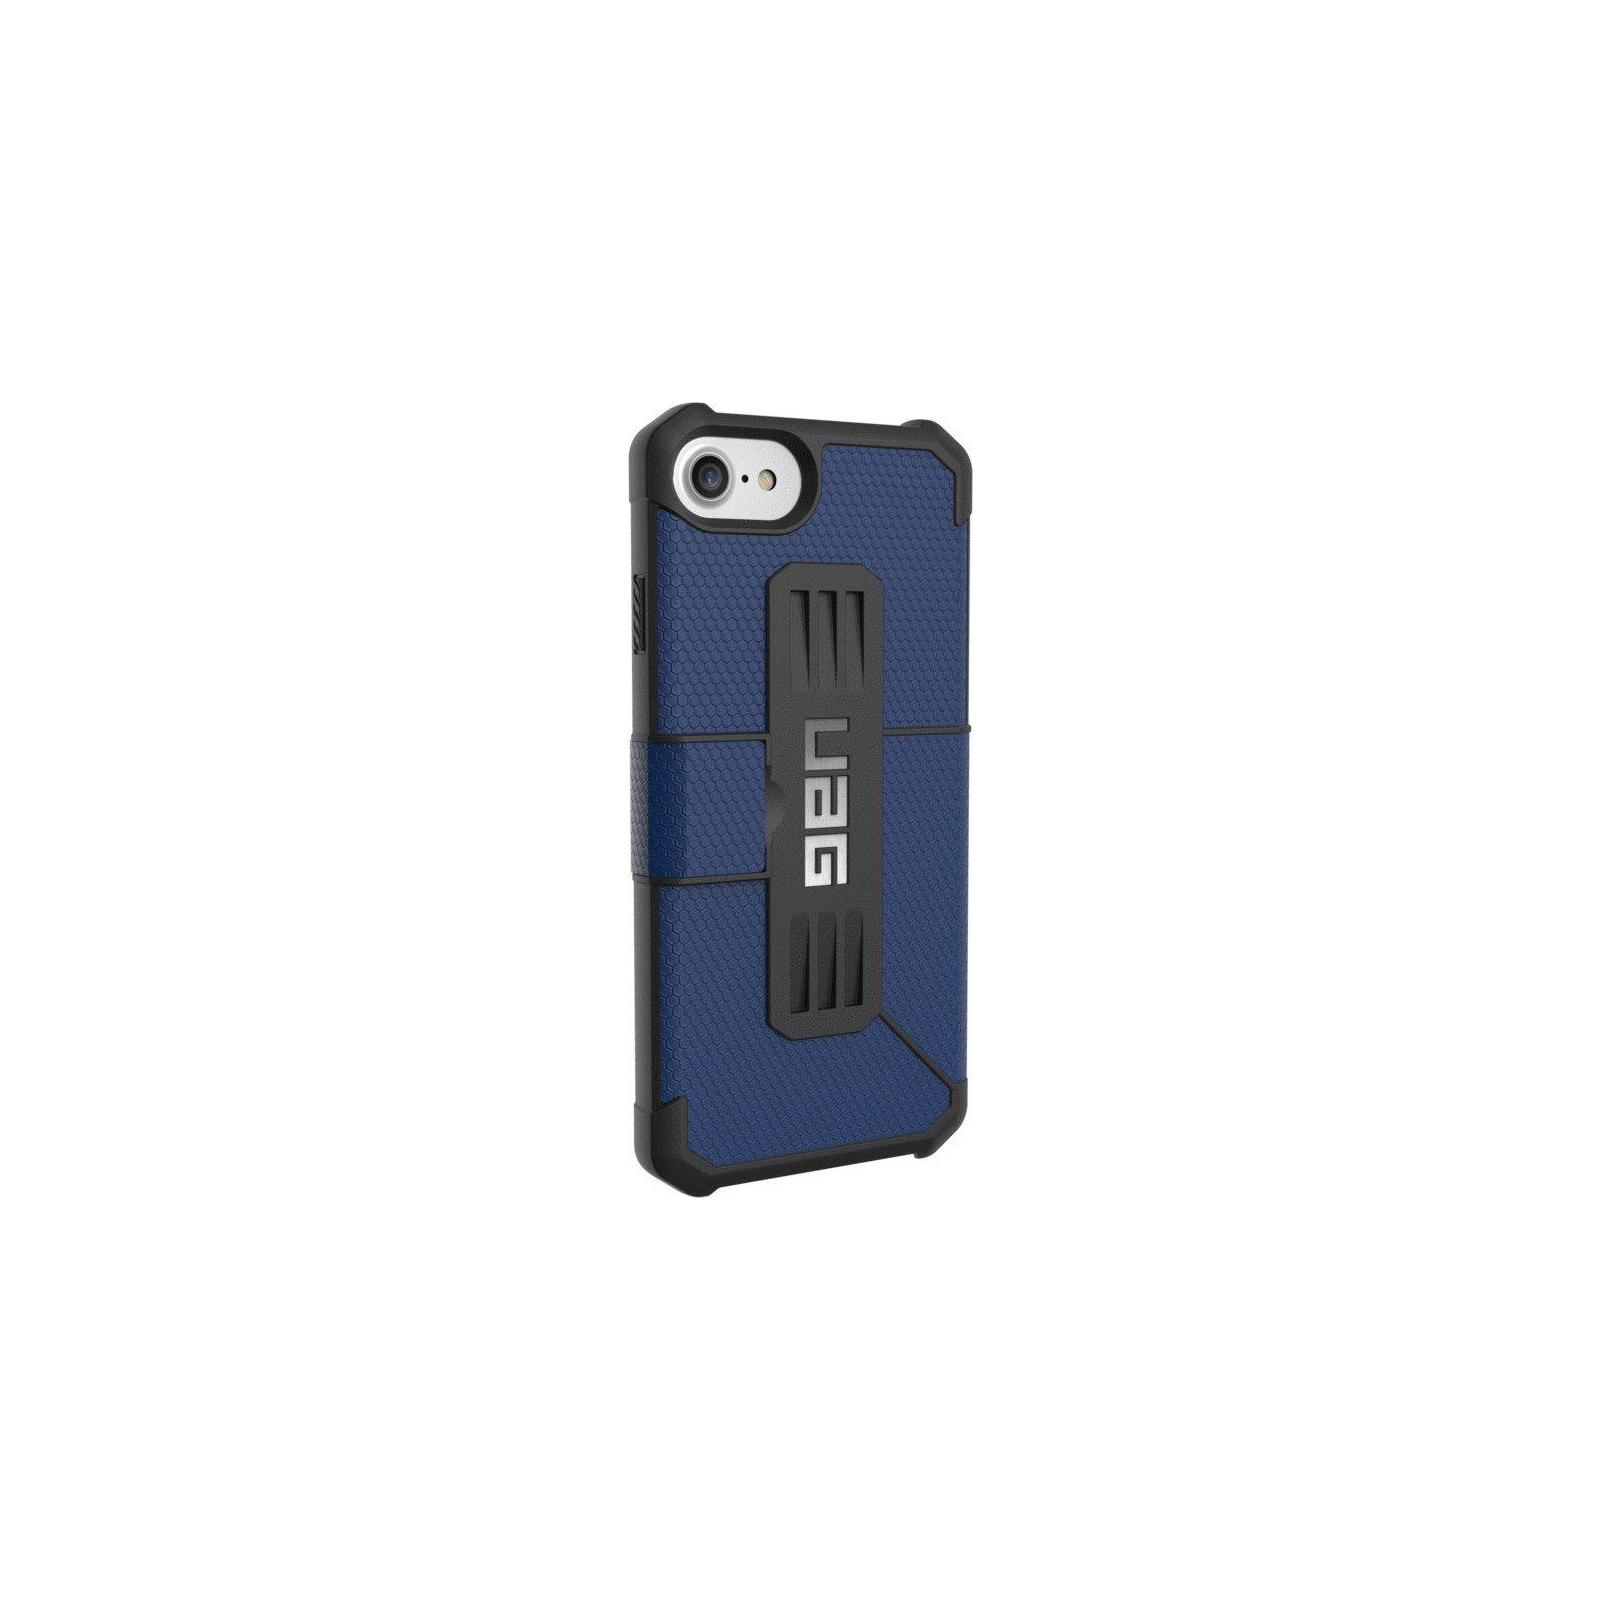 Чехол для моб. телефона UAG iPhone 8/7/6S/6 Metropolis Blue (IPH8/7-E-CB) изображение 4